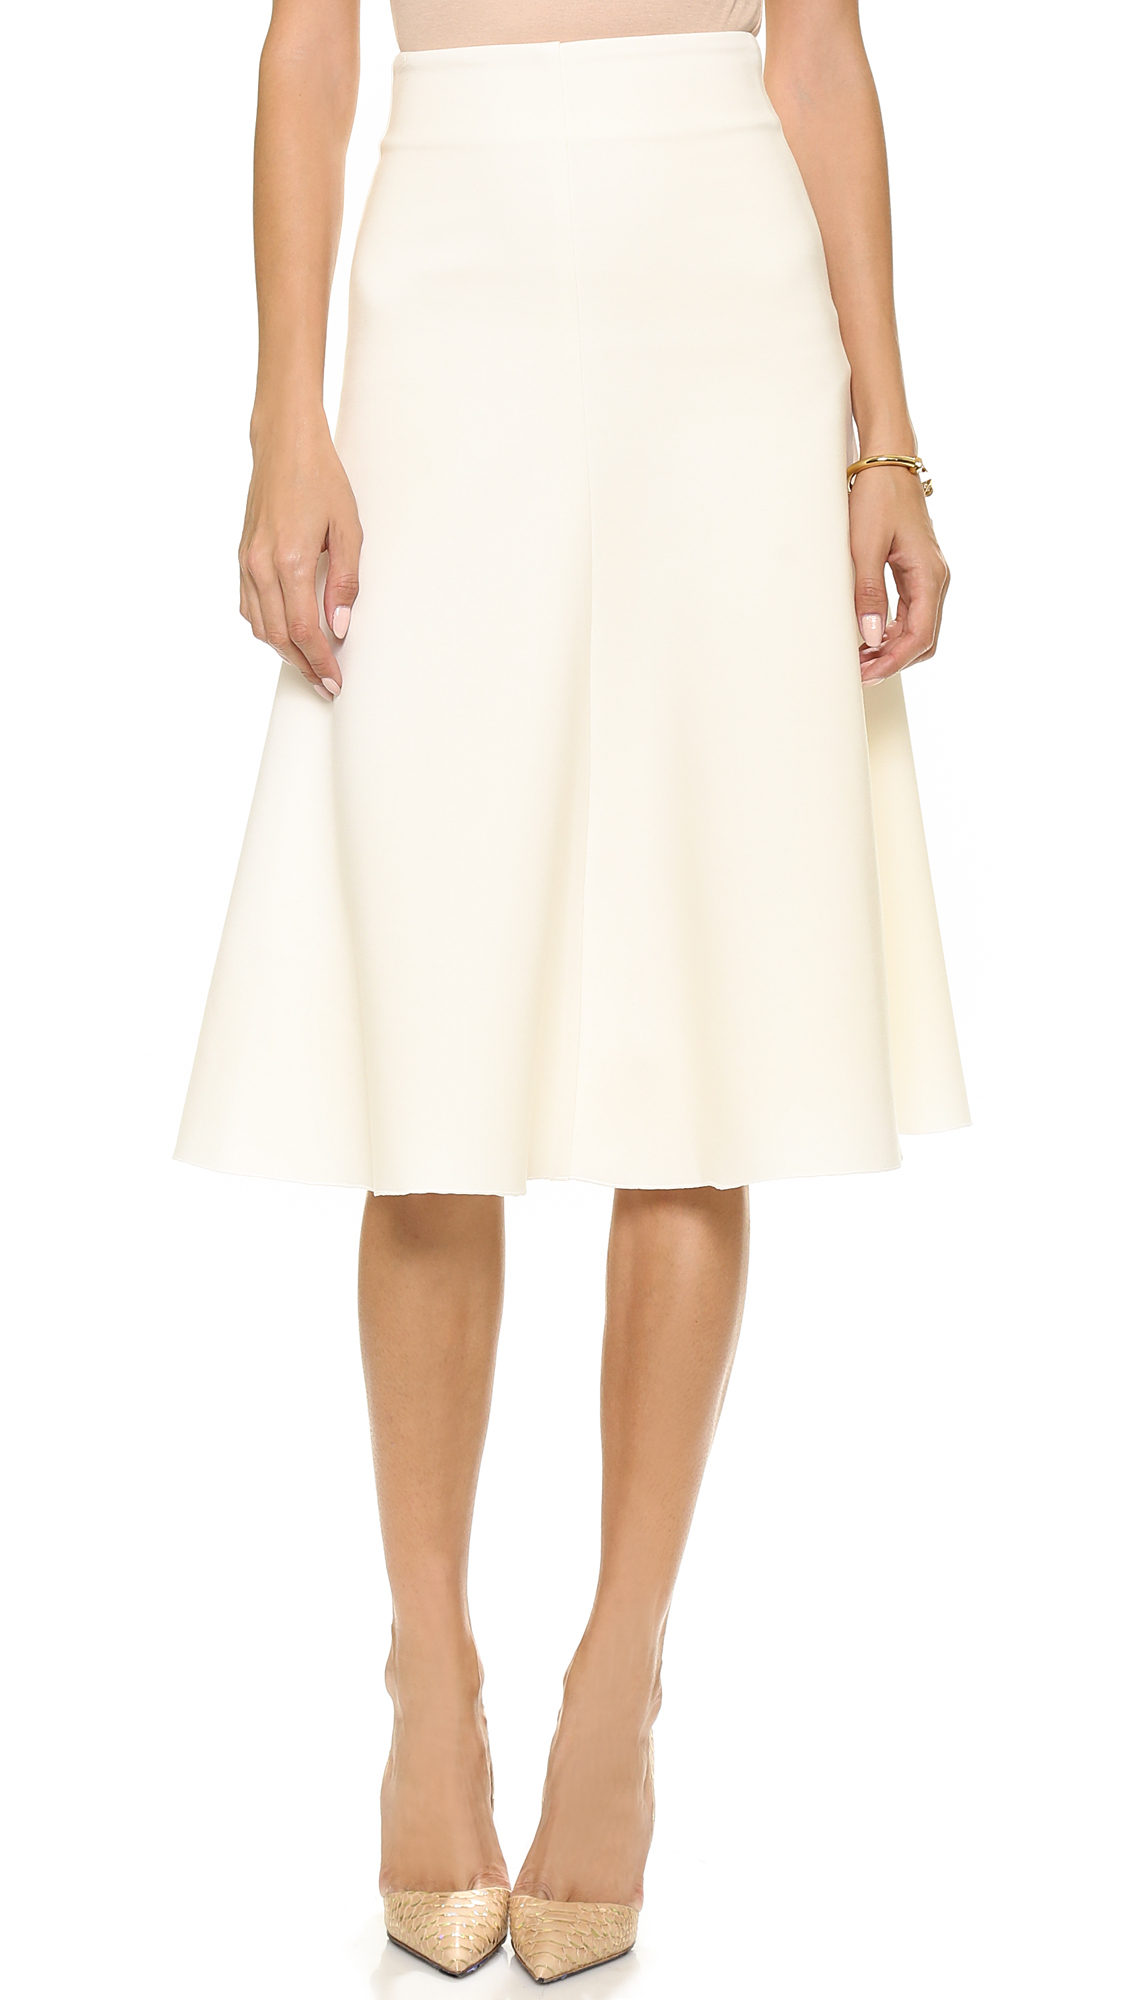 7df2831c349 Nicholas Ponte Flare Skirt Black in White - Lyst